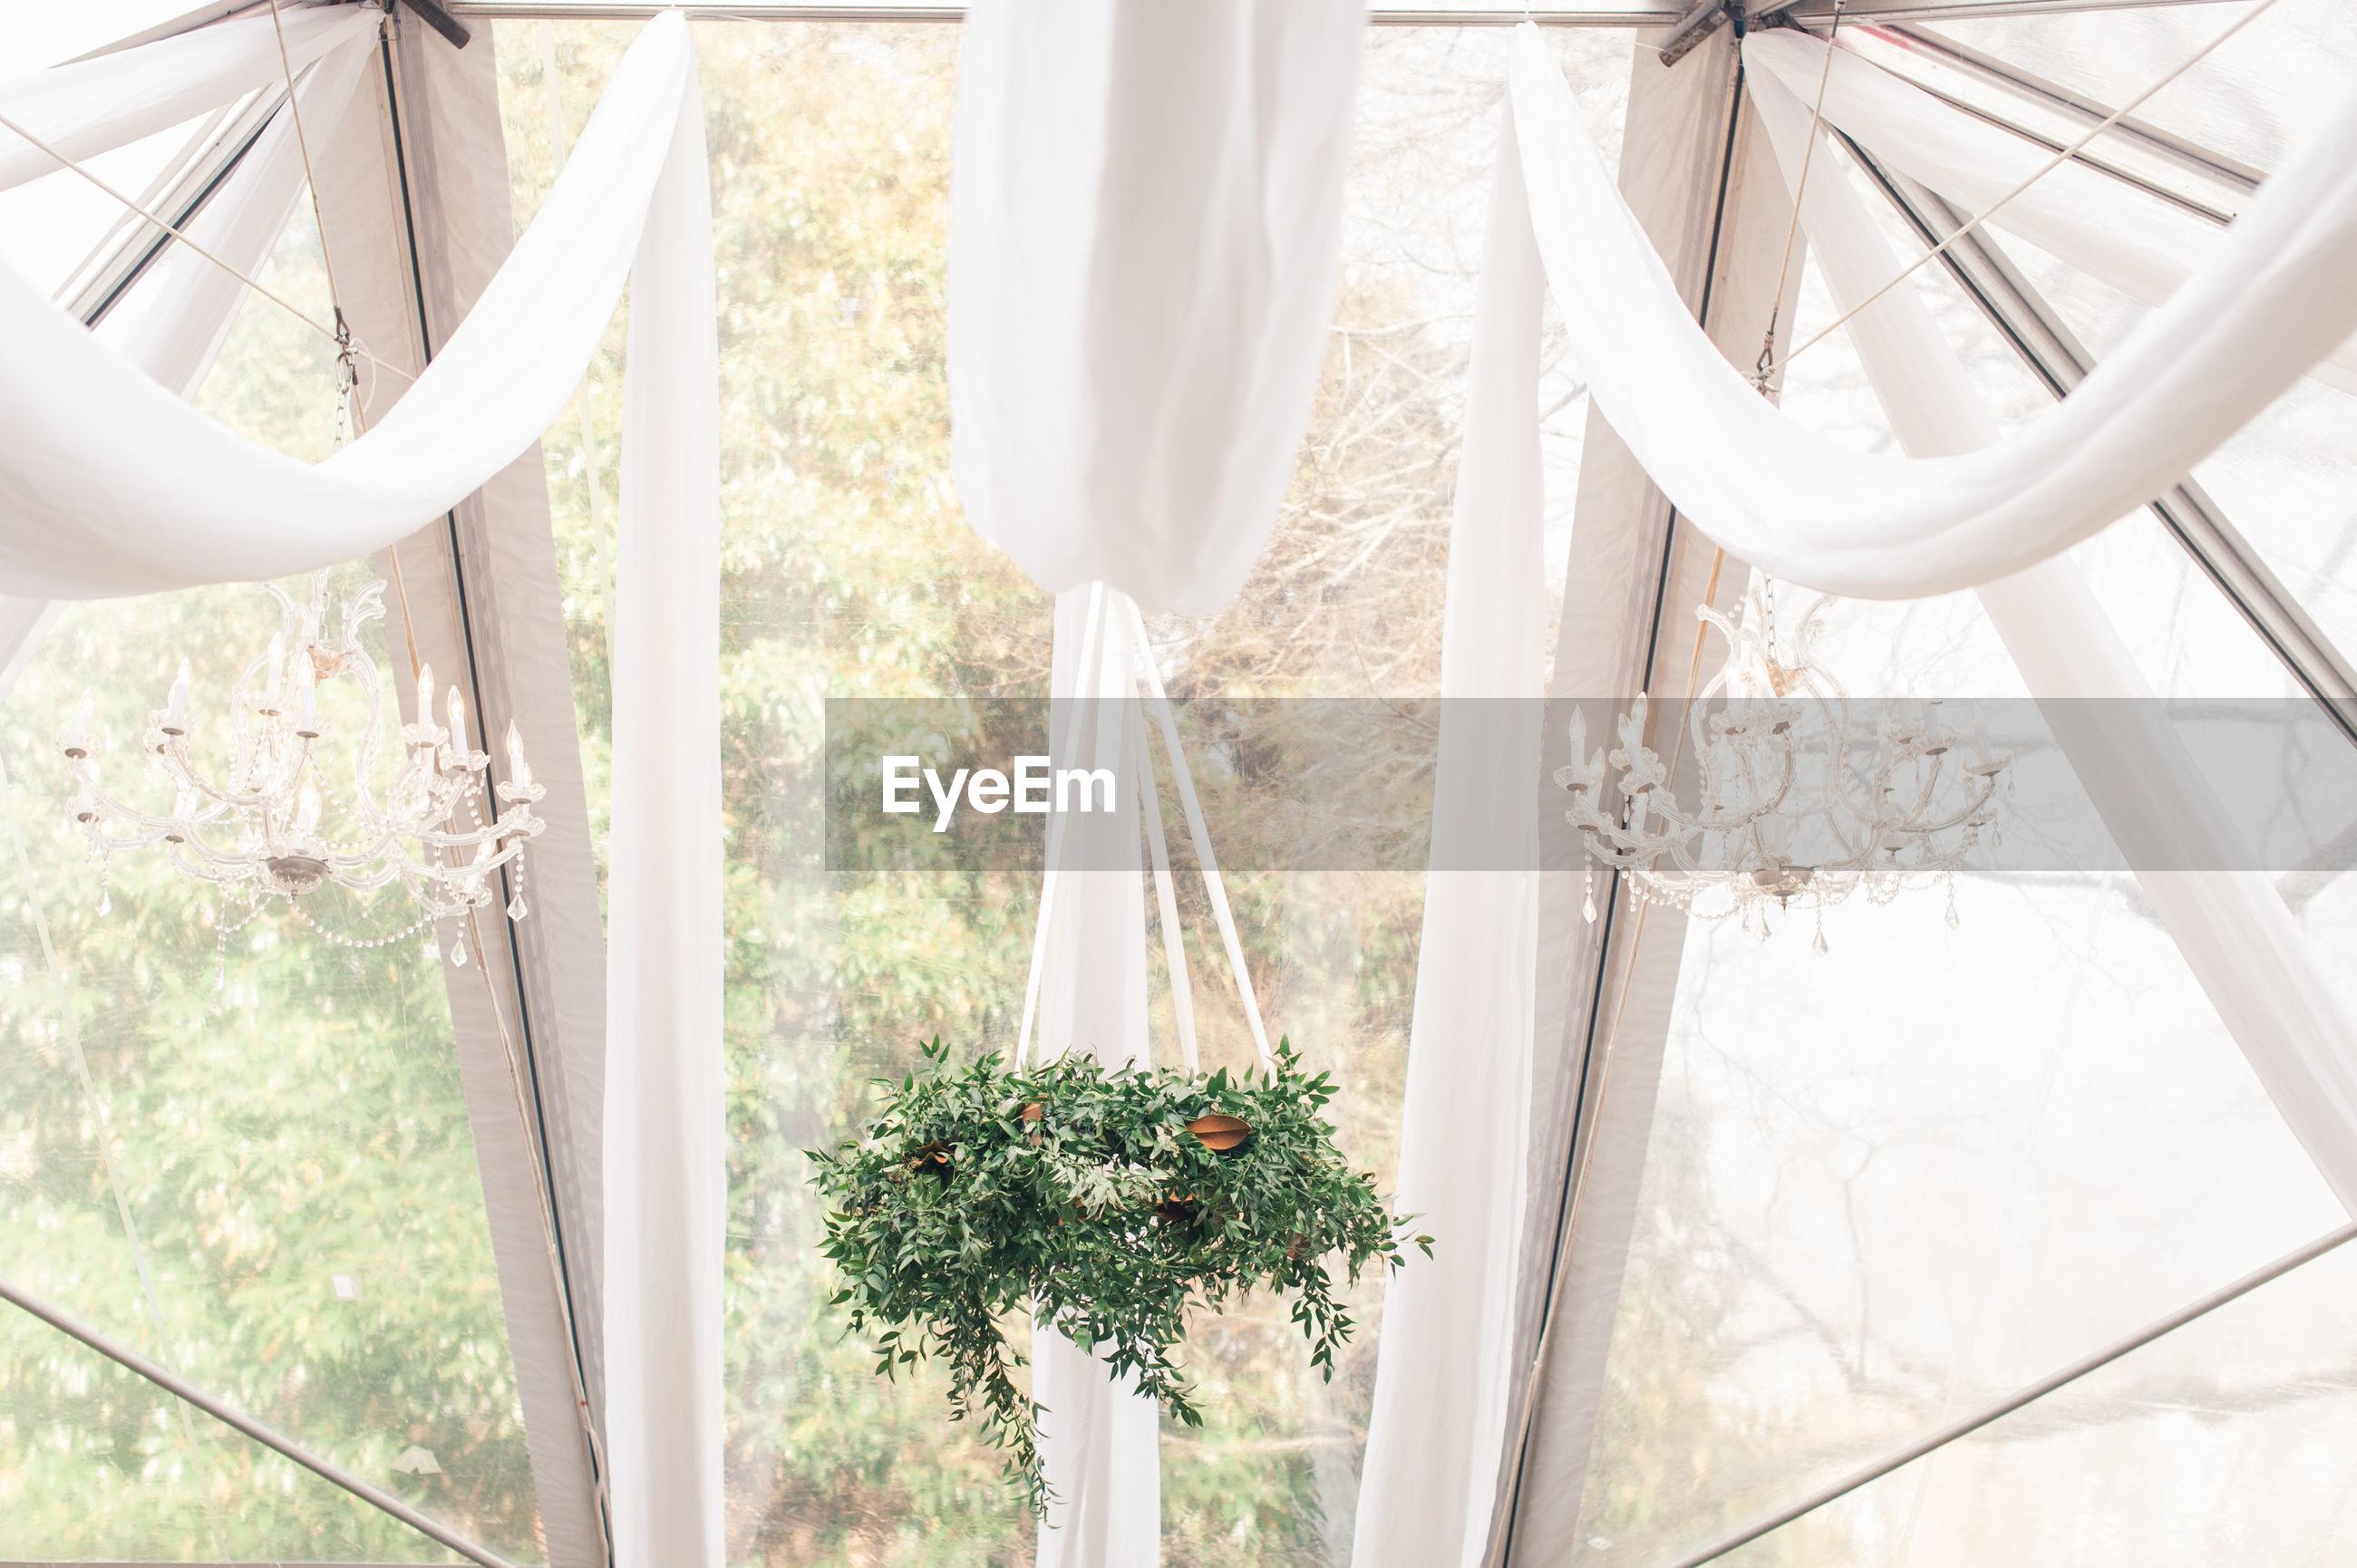 Decoration during wedding